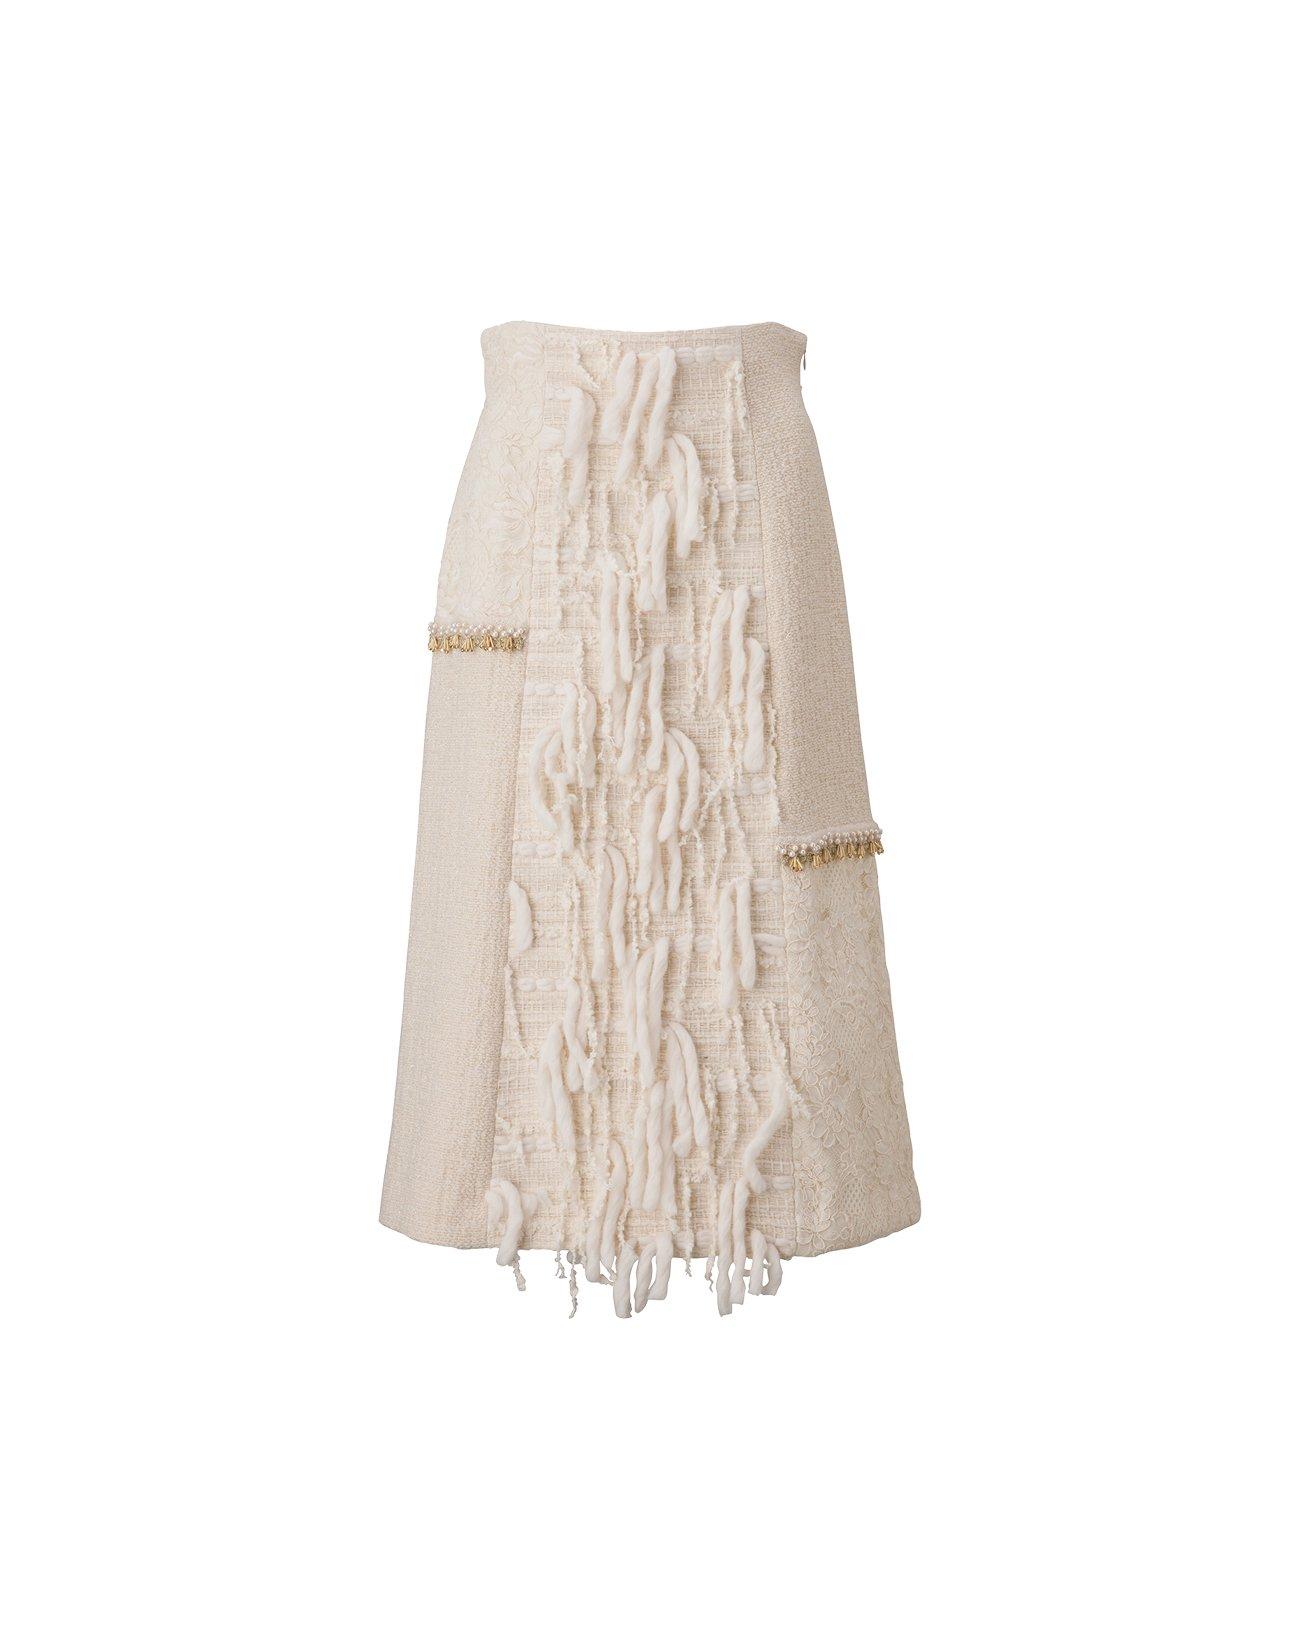 Roving Tweed Skirt - Off White